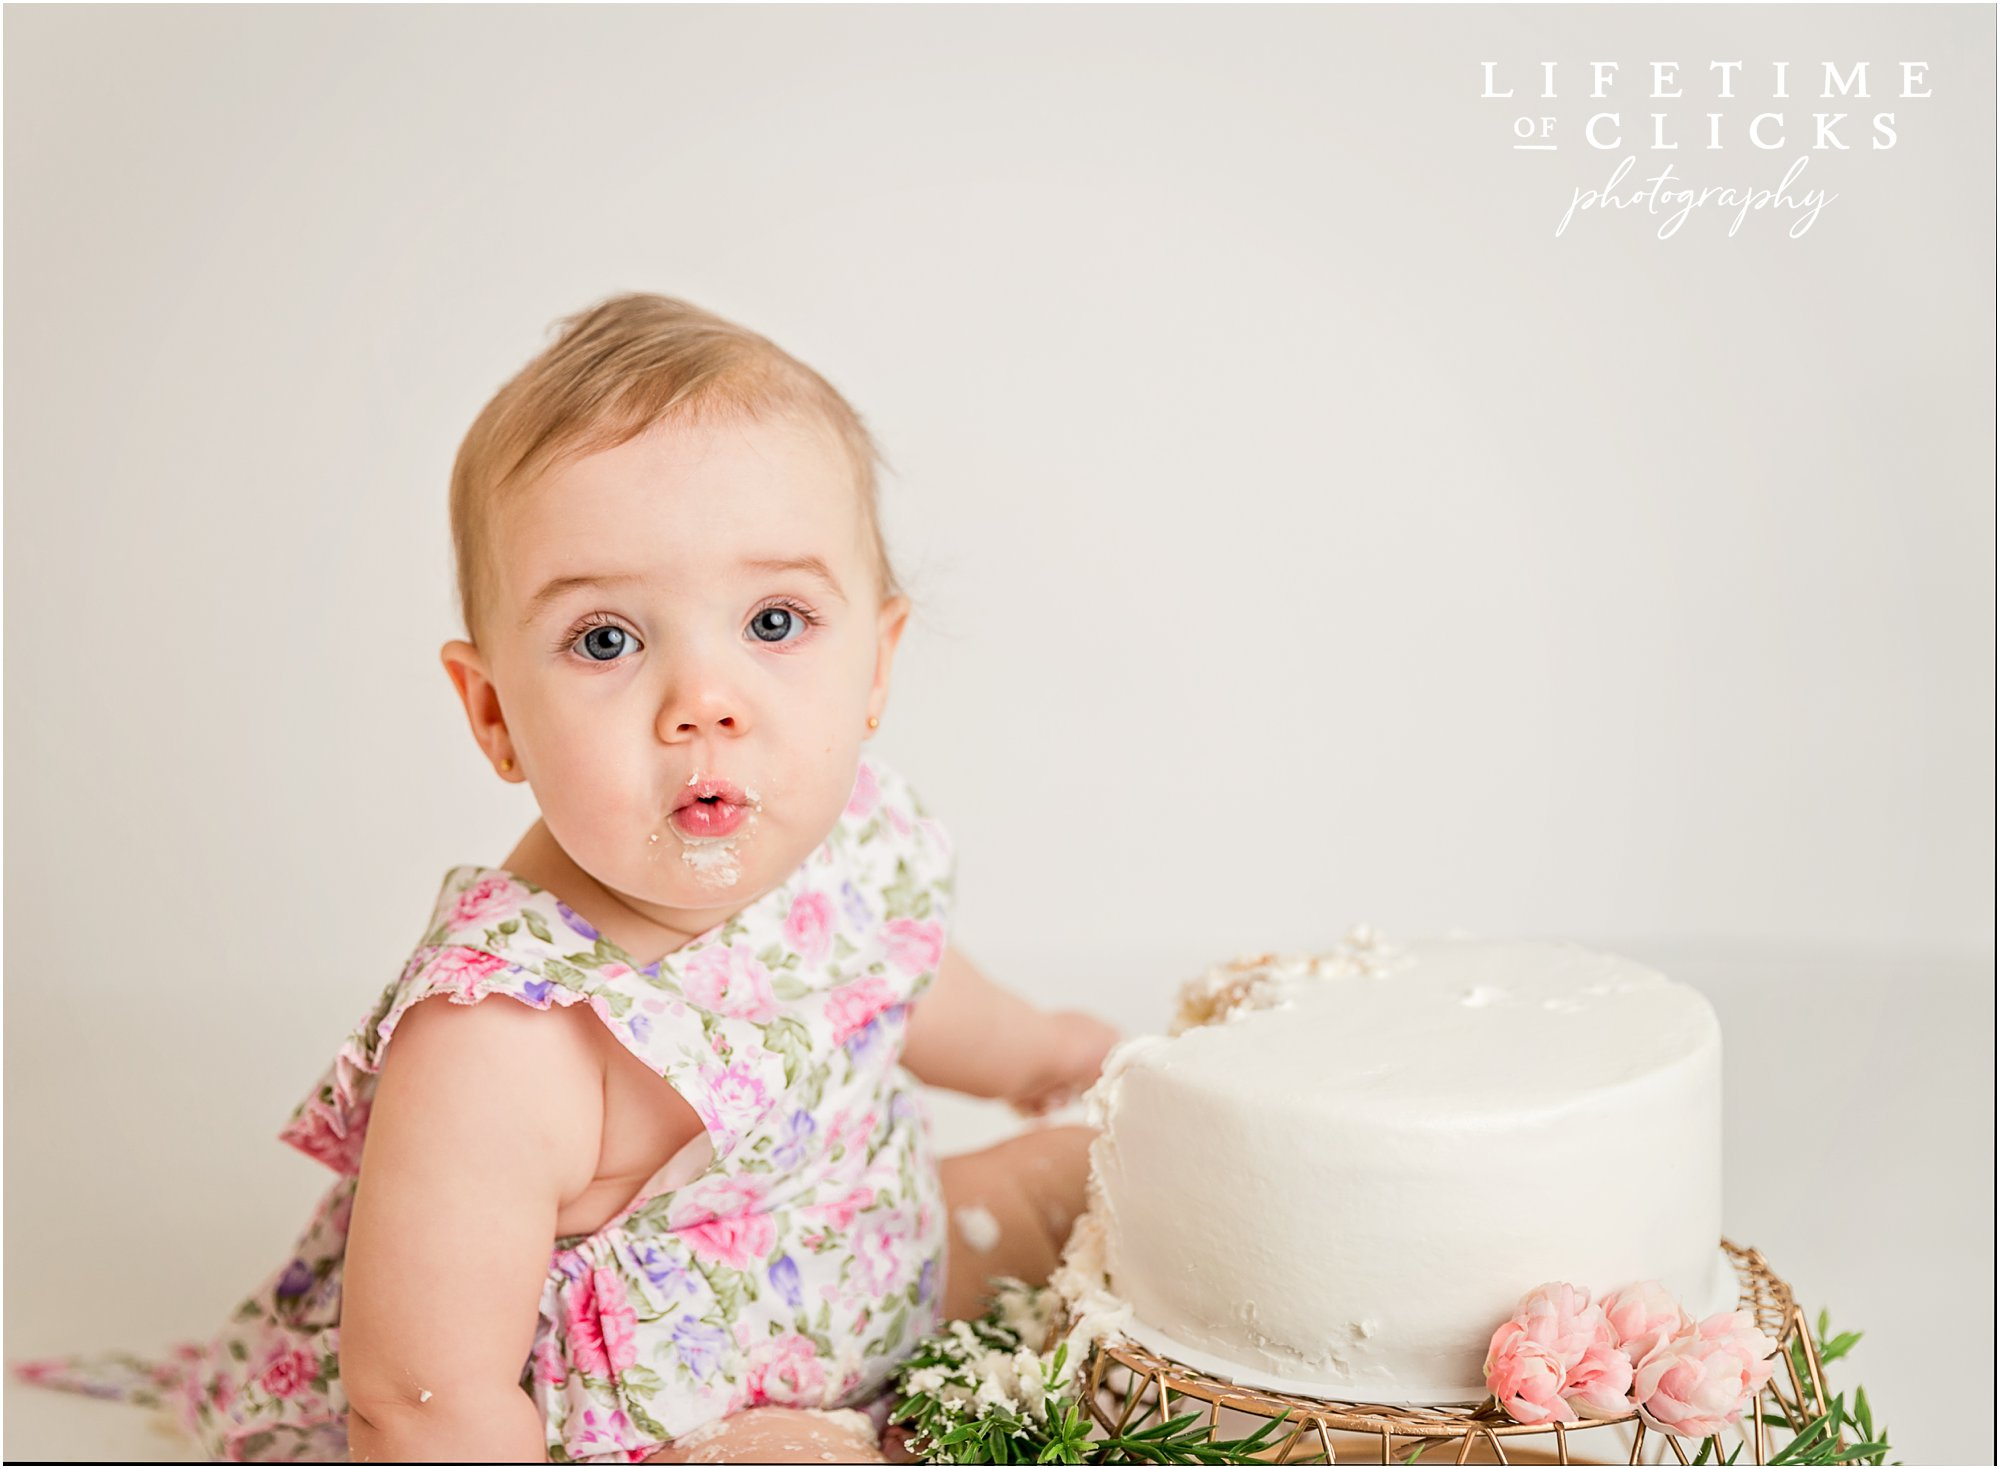 blue eyed girl eating birthday cake